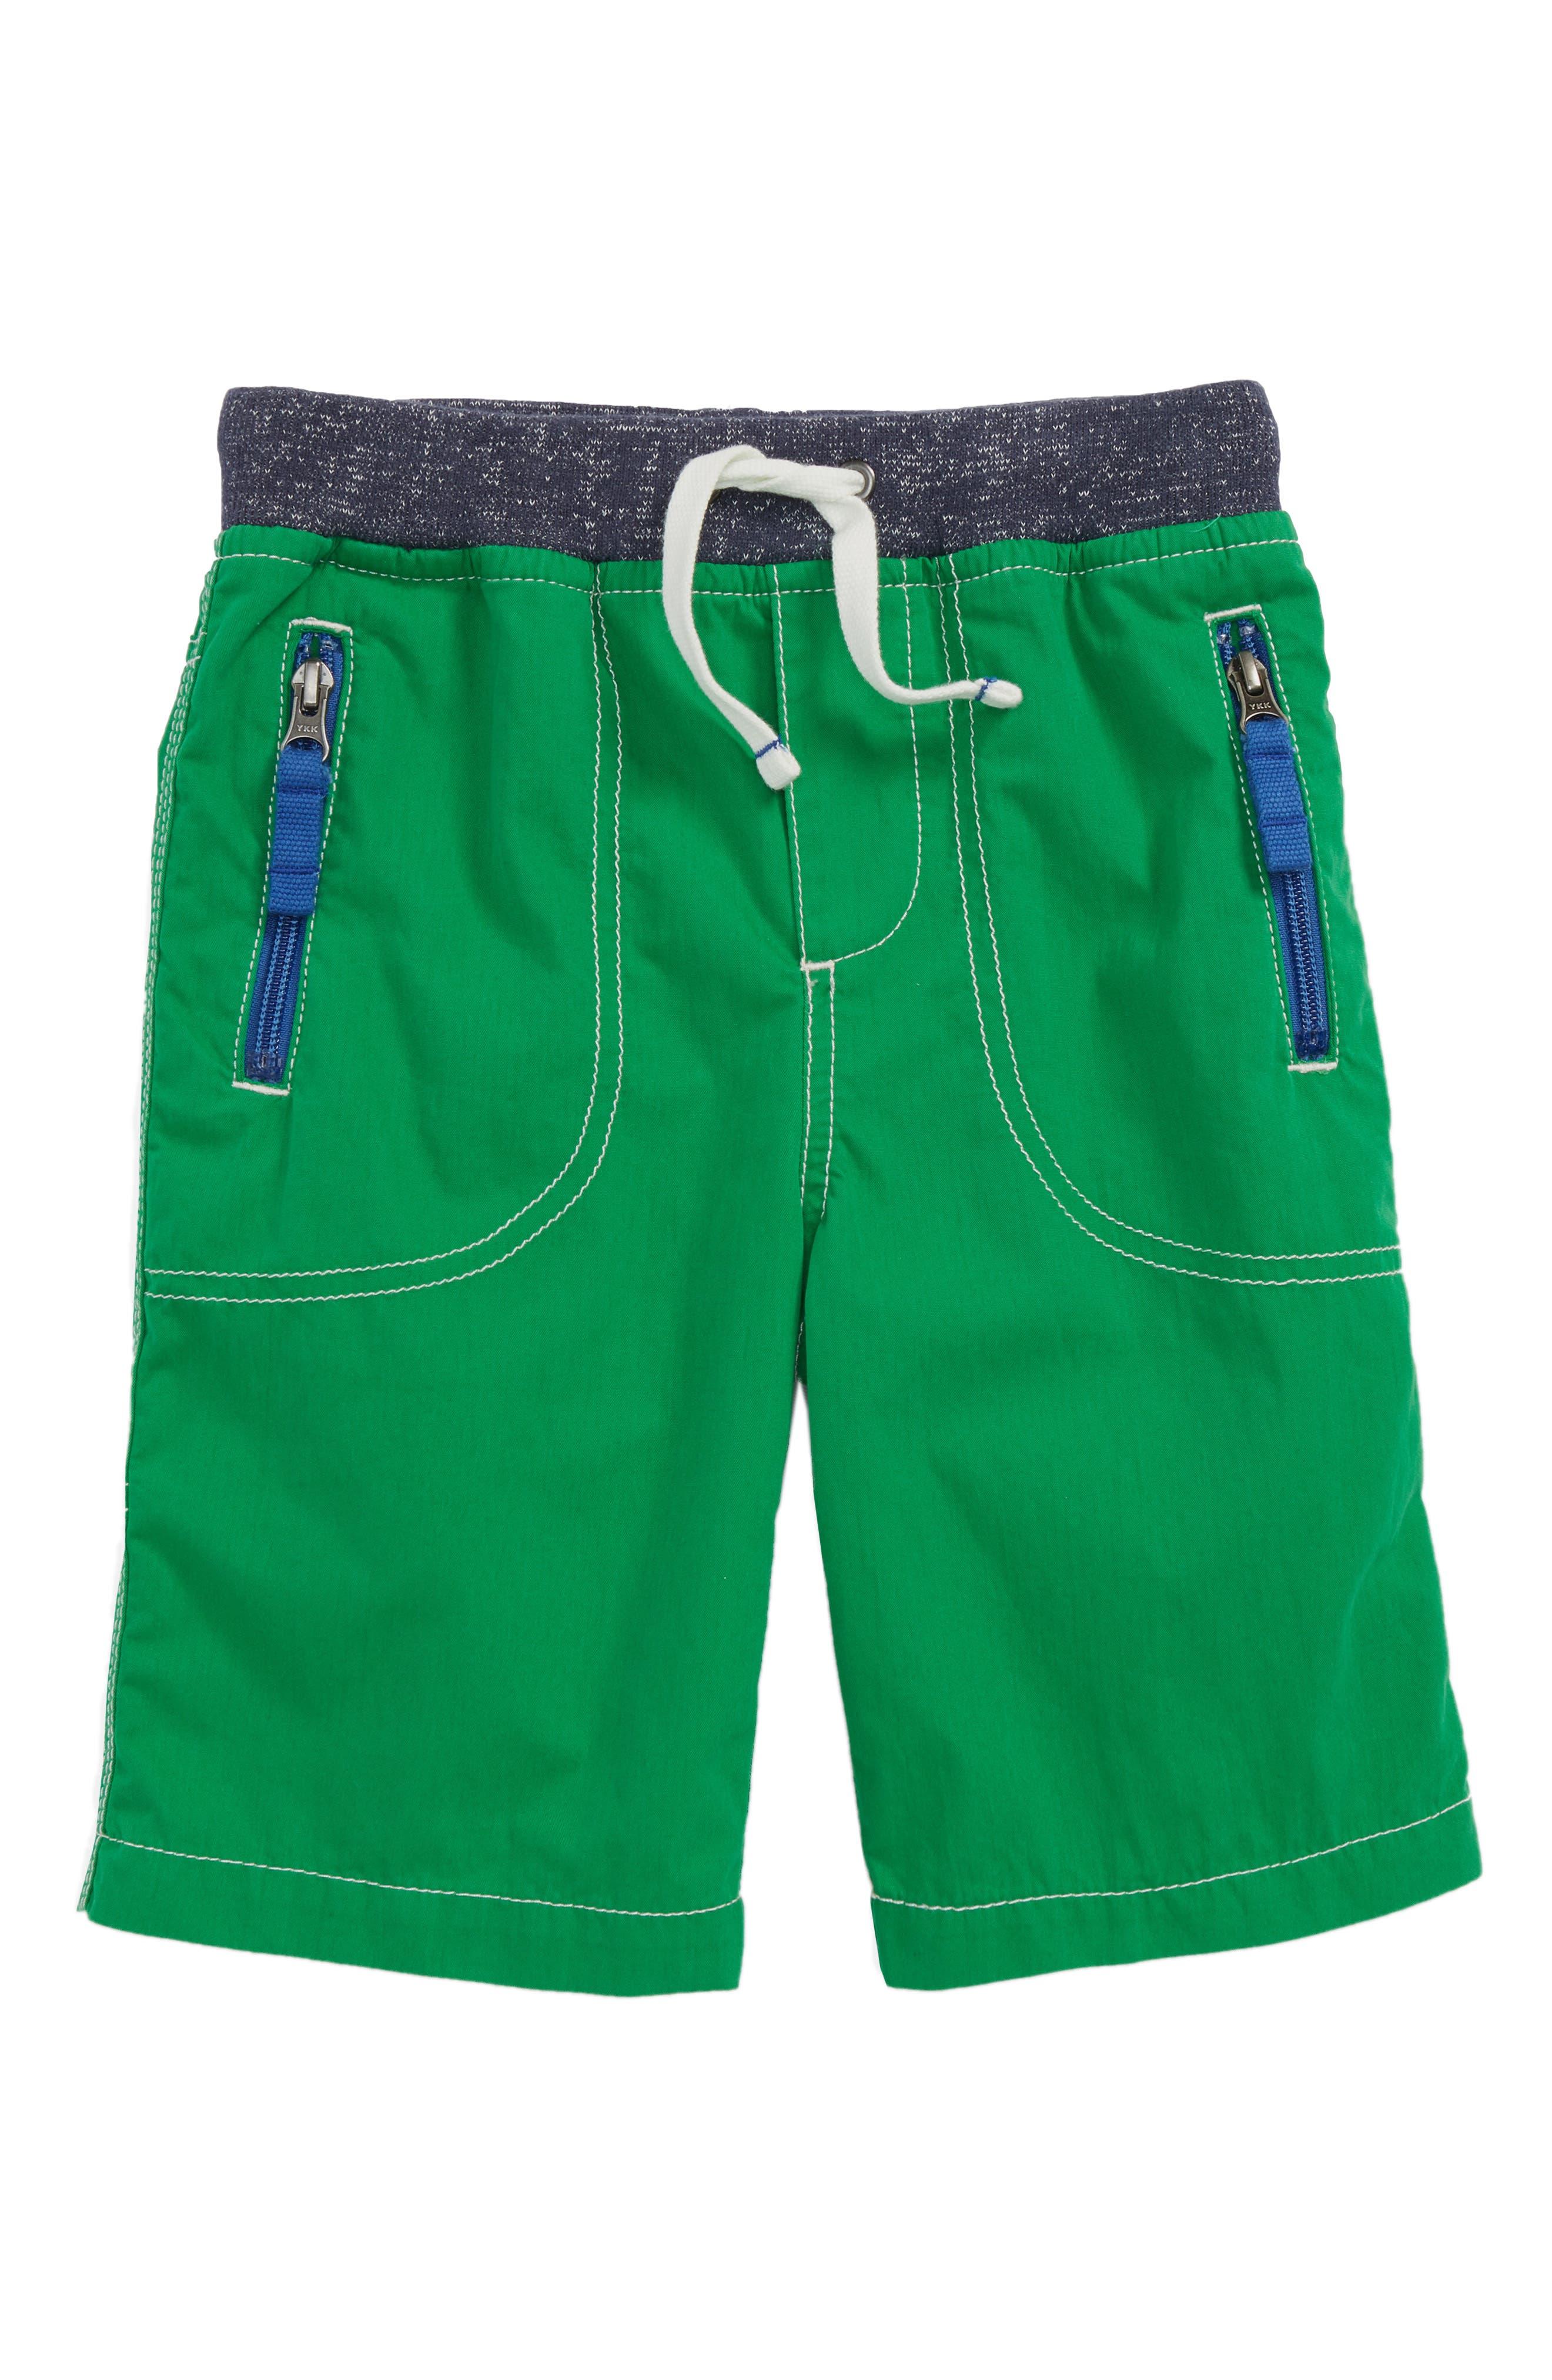 Adventure Shorts,                             Main thumbnail 1, color,                             Runner Bean Green